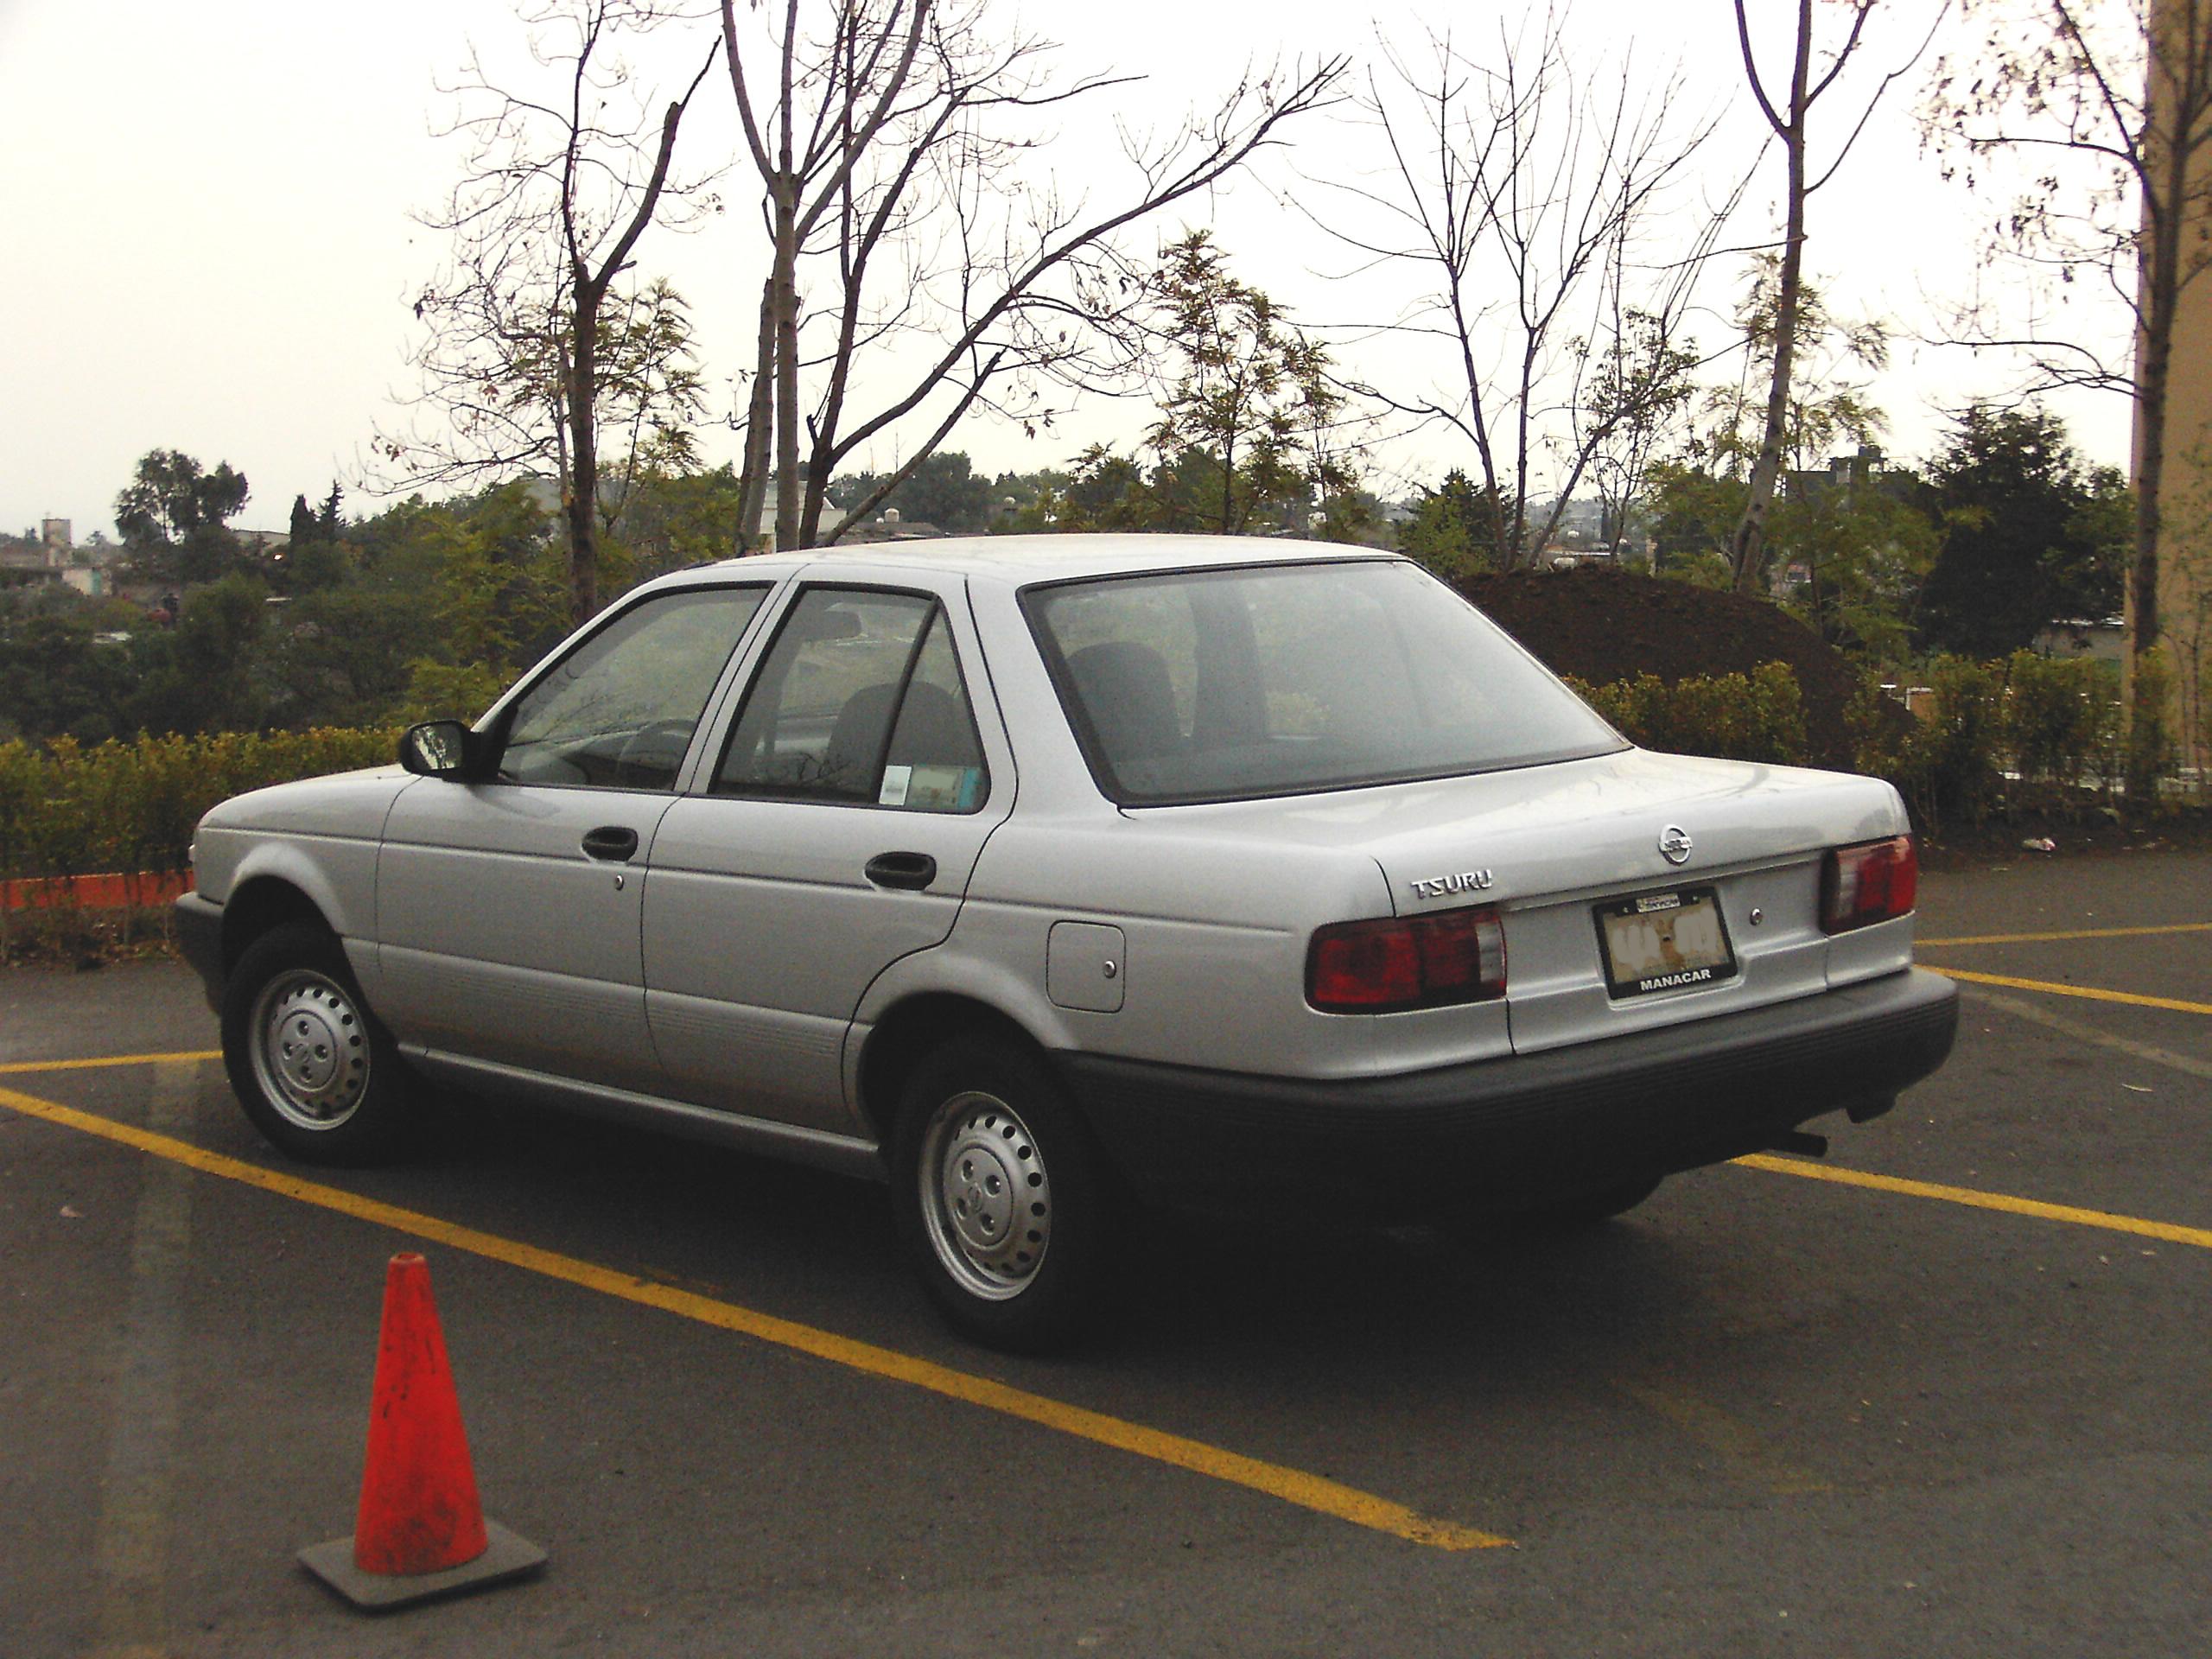 File:Nissan Tsuru.JPG - Wikimedia Commons